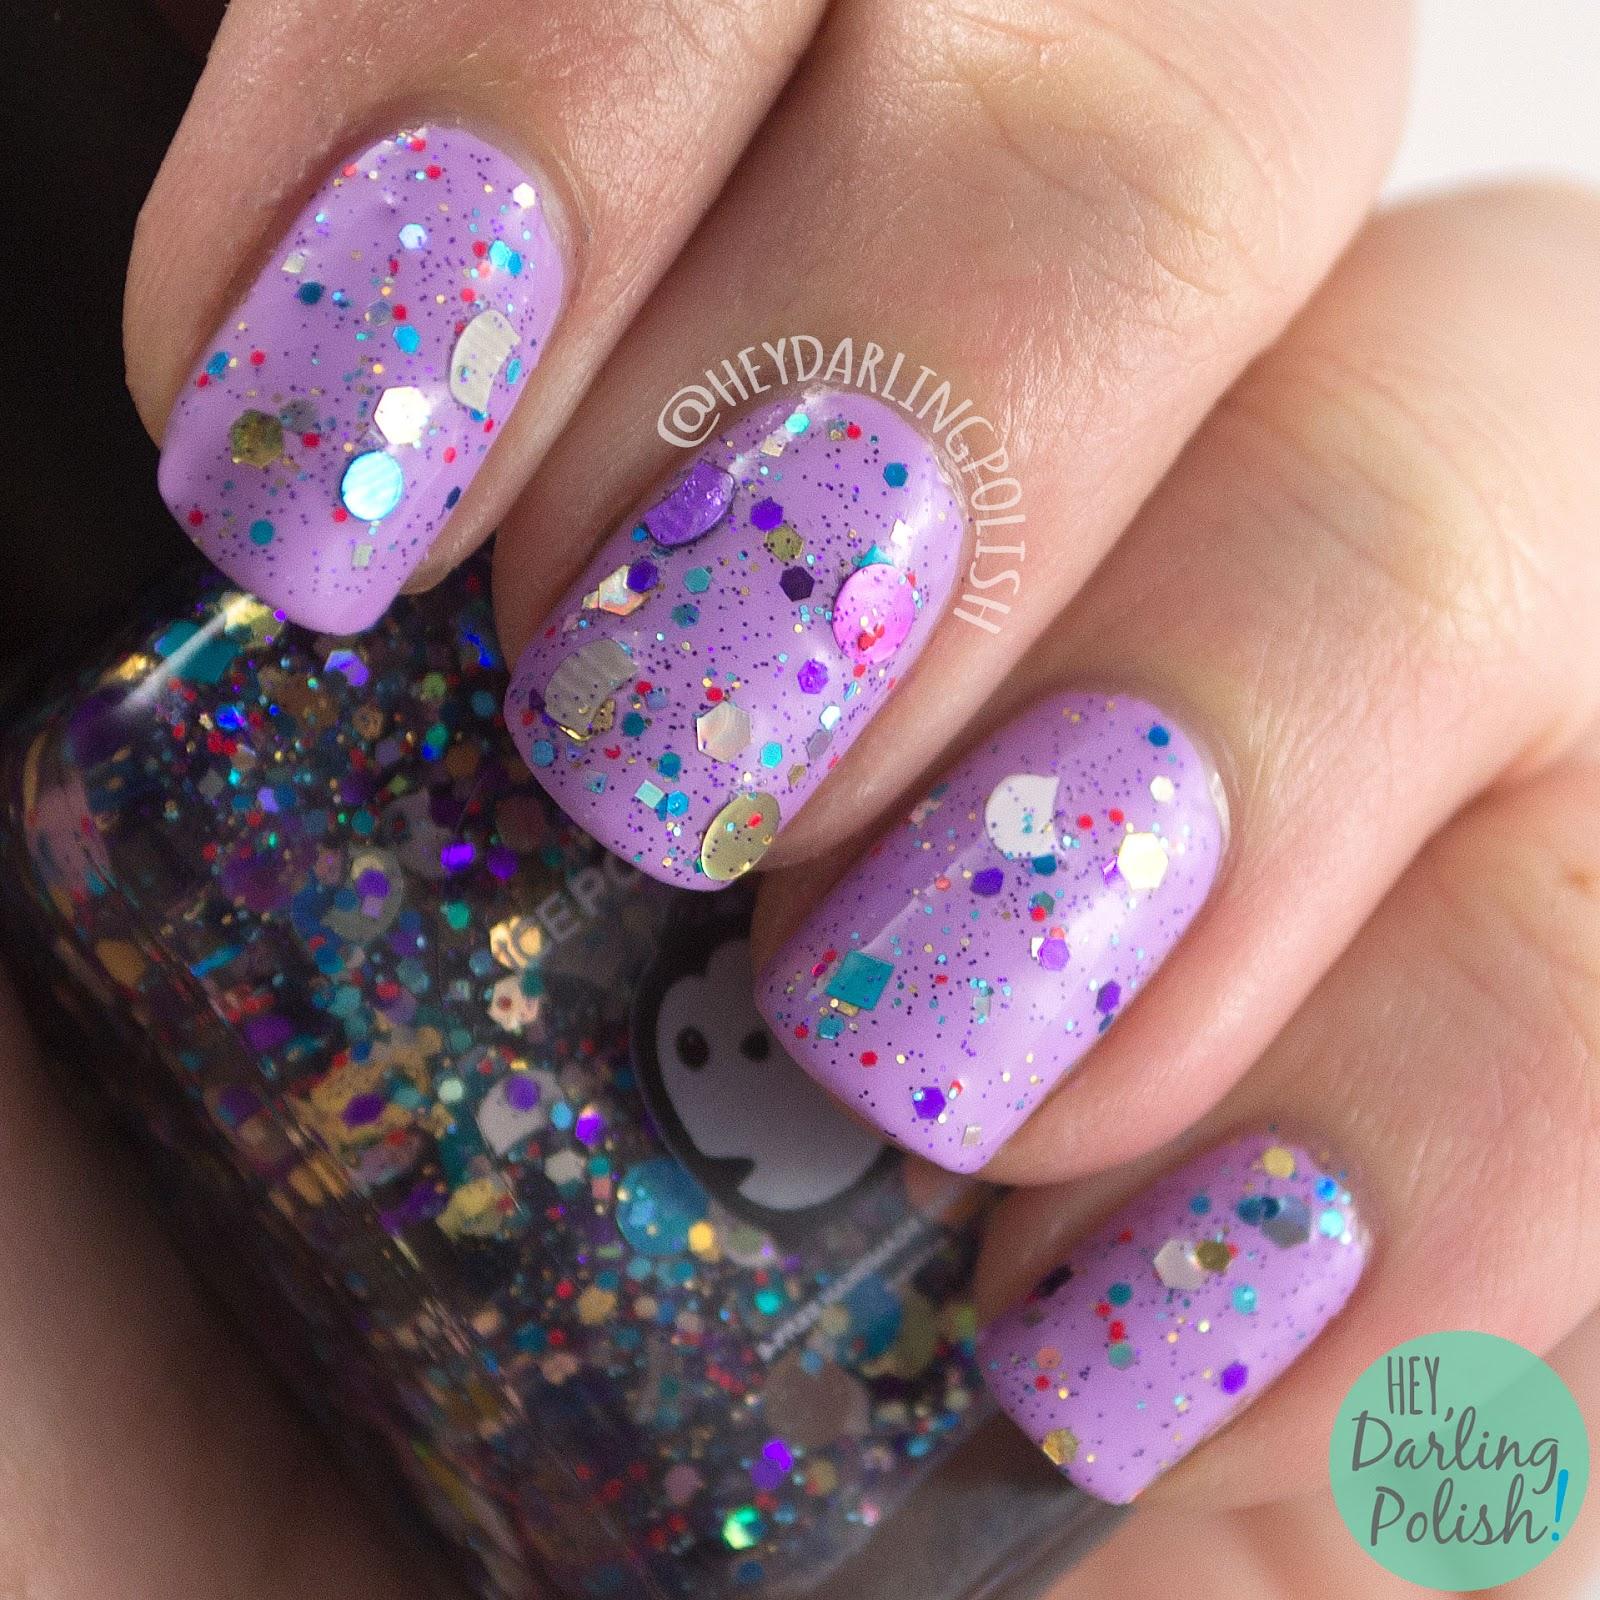 glitter, cats, meow-di gras, mardi gras, nails, nail polish, indie polish, indie nail polish, hey darling polish, ice polish, swatches